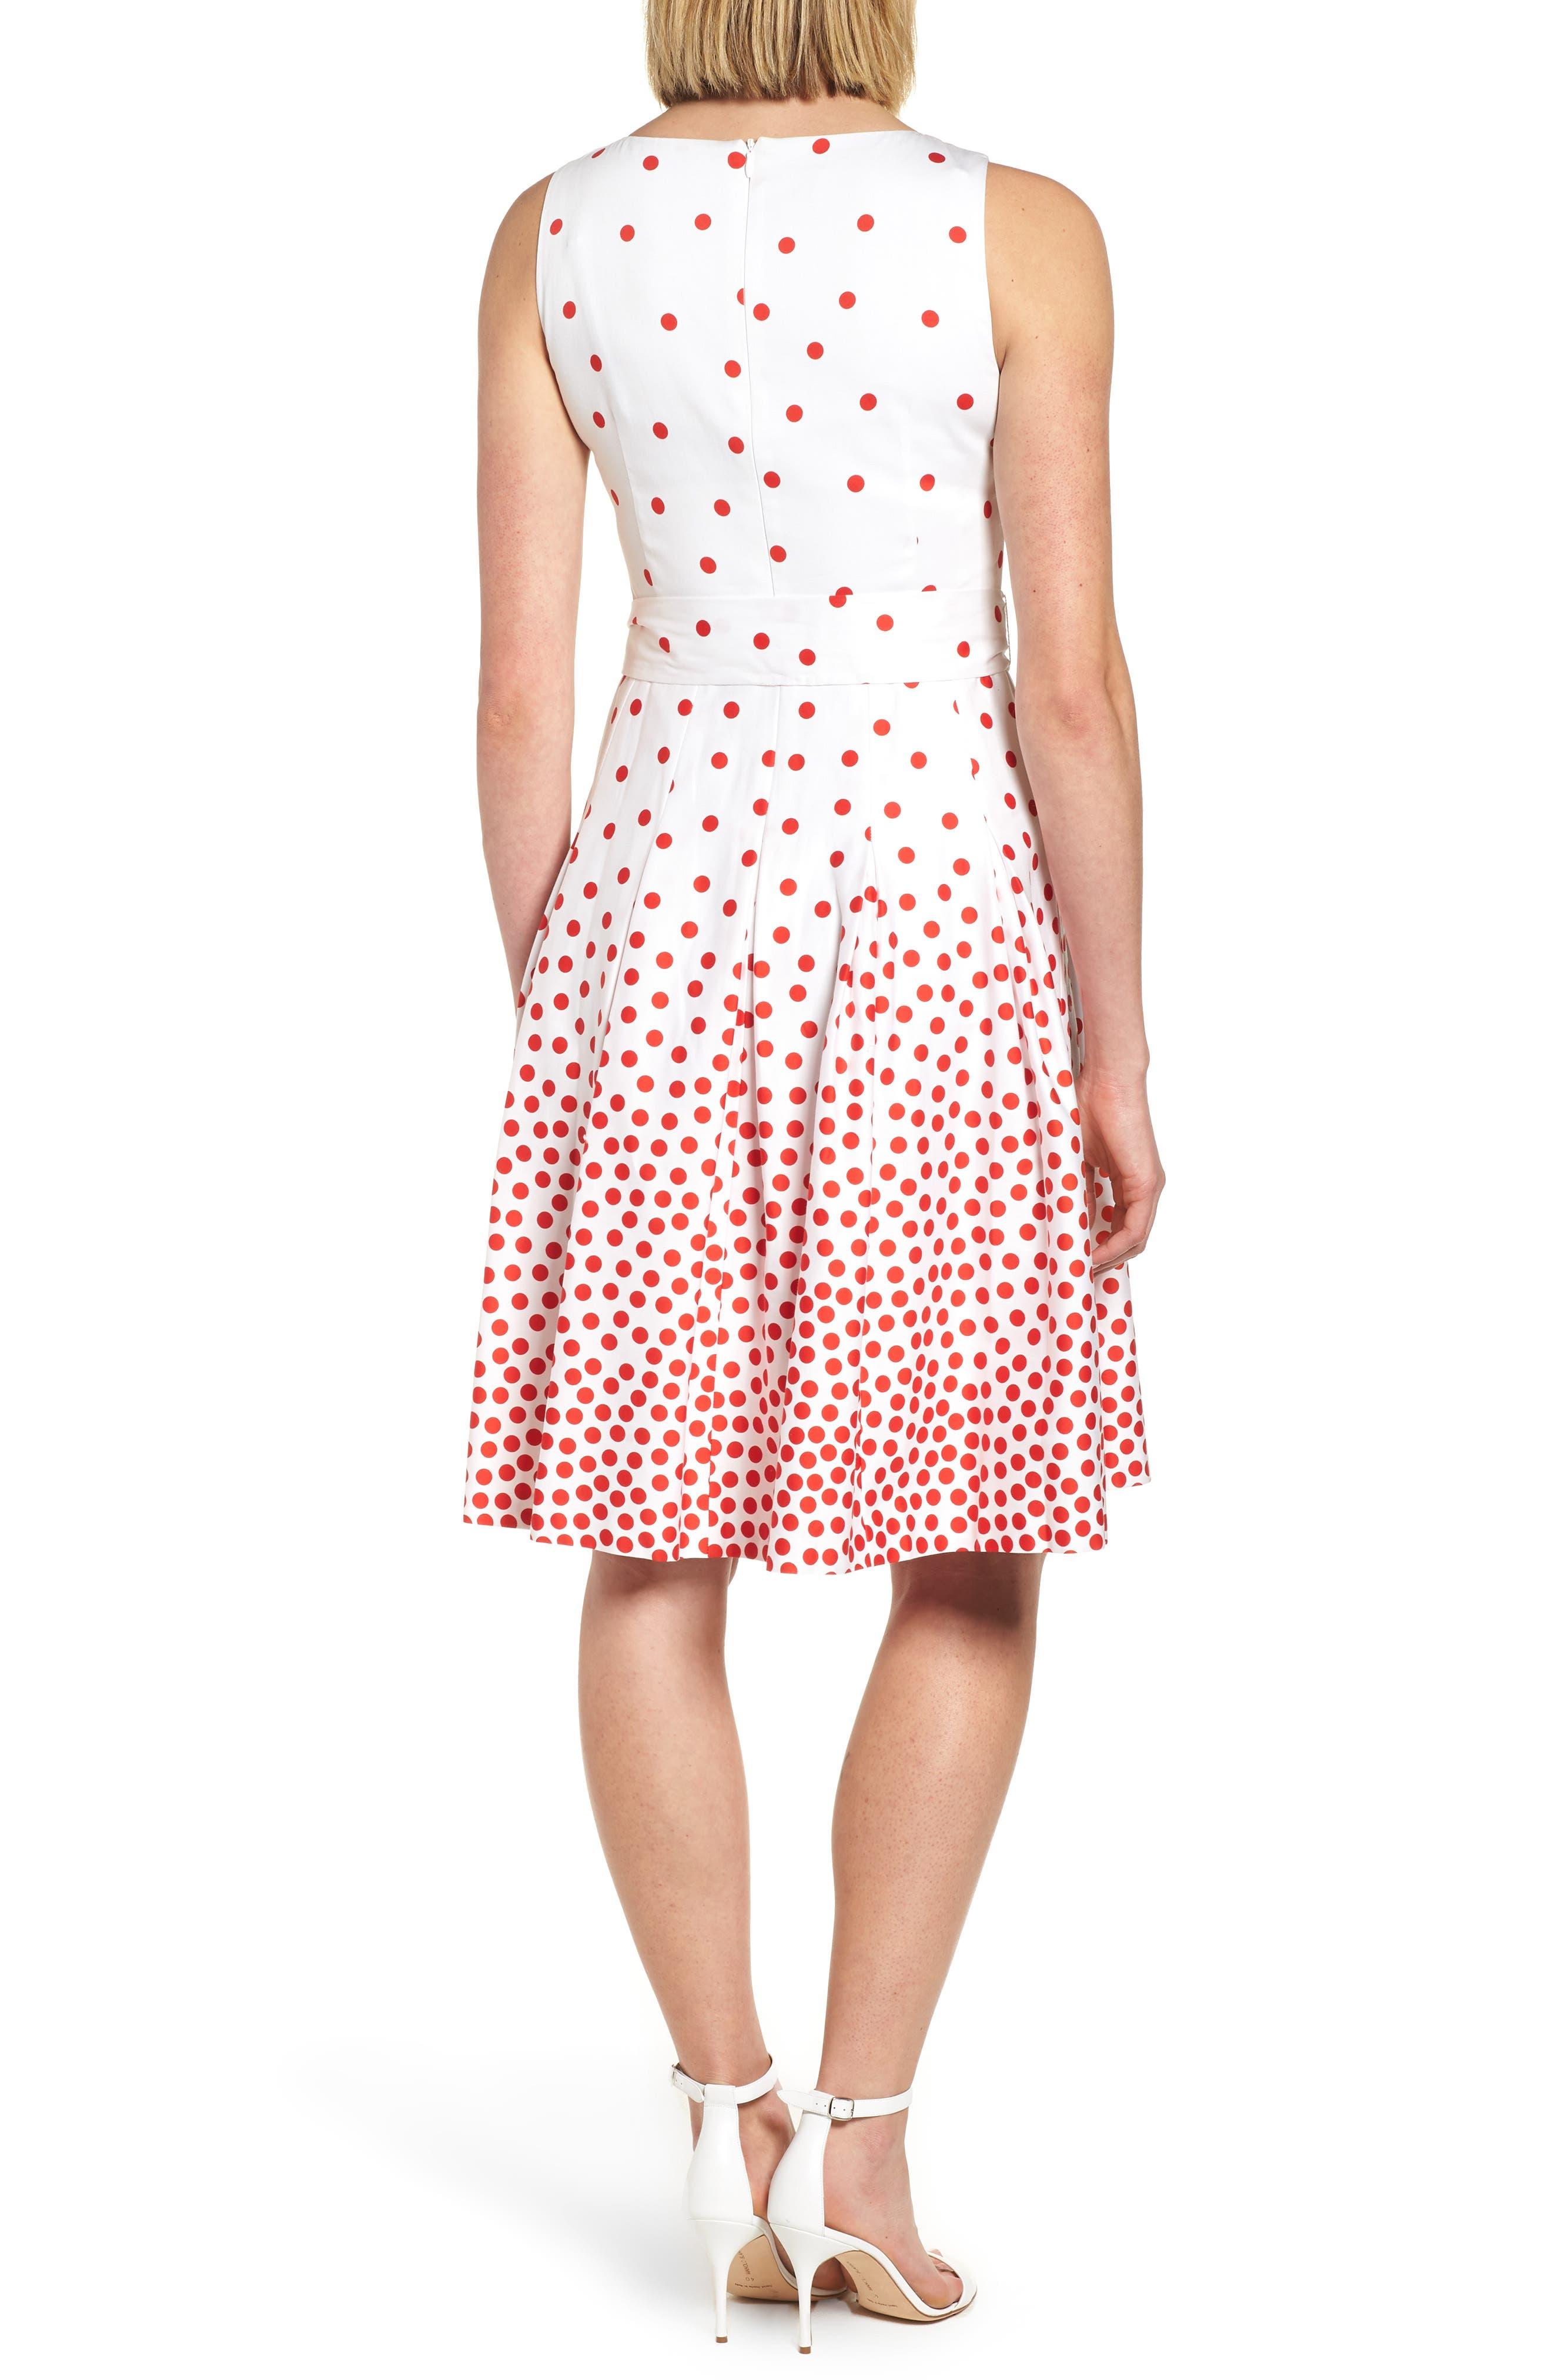 New York Scattered Dot Stretch Cotton Dress,                             Alternate thumbnail 2, color,                             Optic White/ Tomato